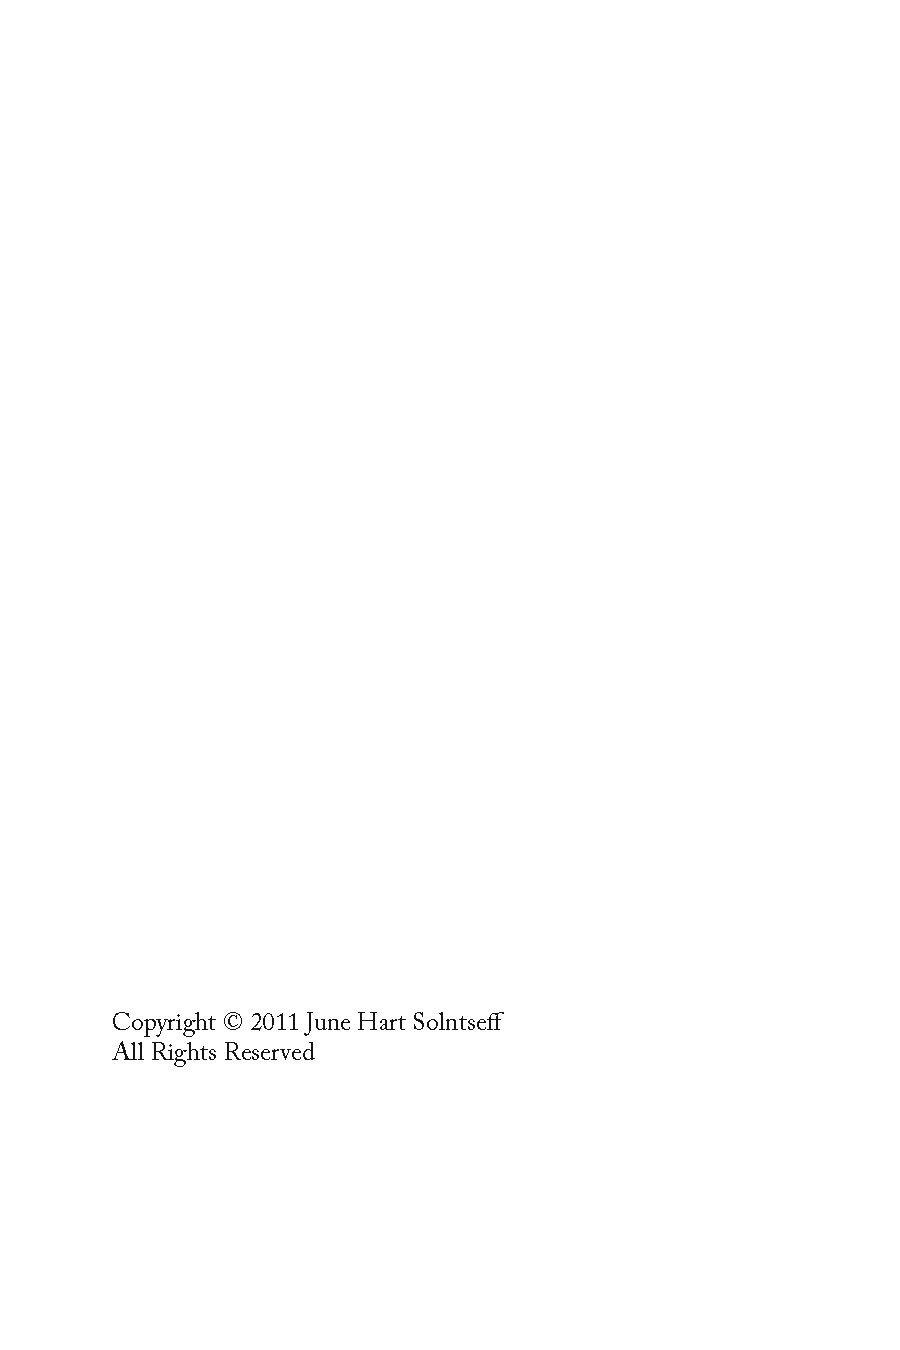 binder5_page_04.jpg